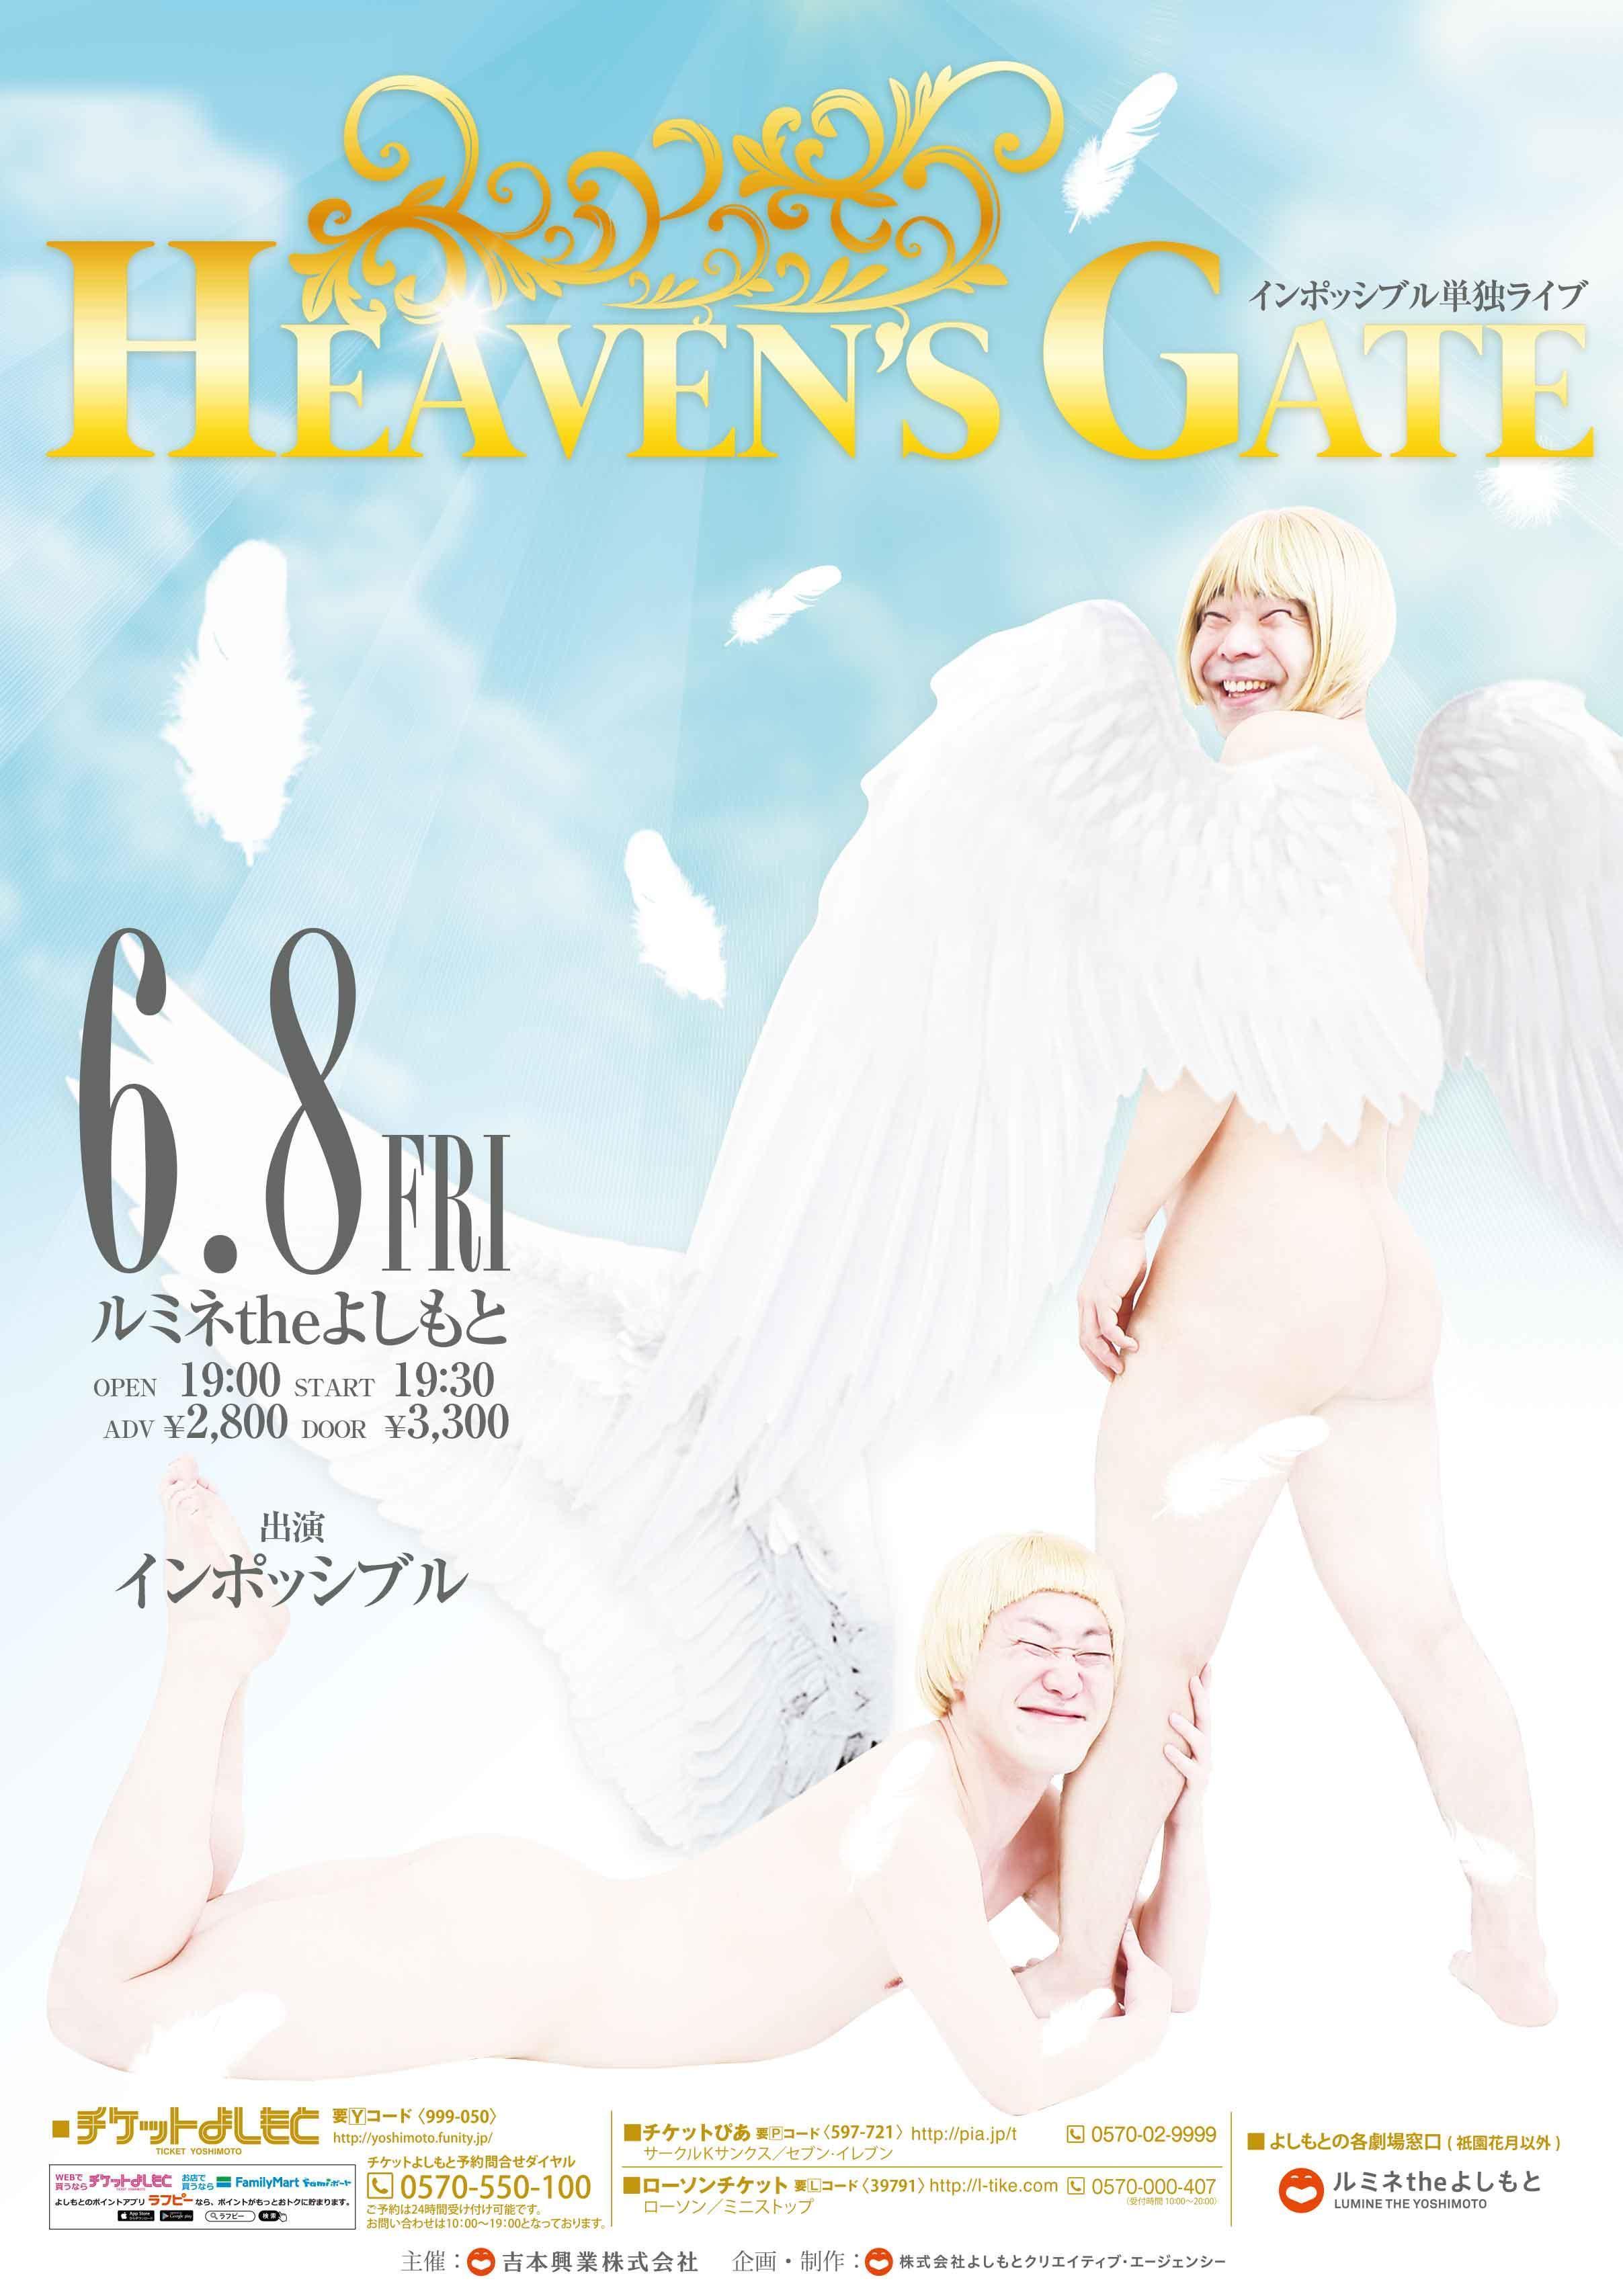 http://news.yoshimoto.co.jp/20180517101022-7be06a1858e67ff40a8e549429244442c23091e2.jpg